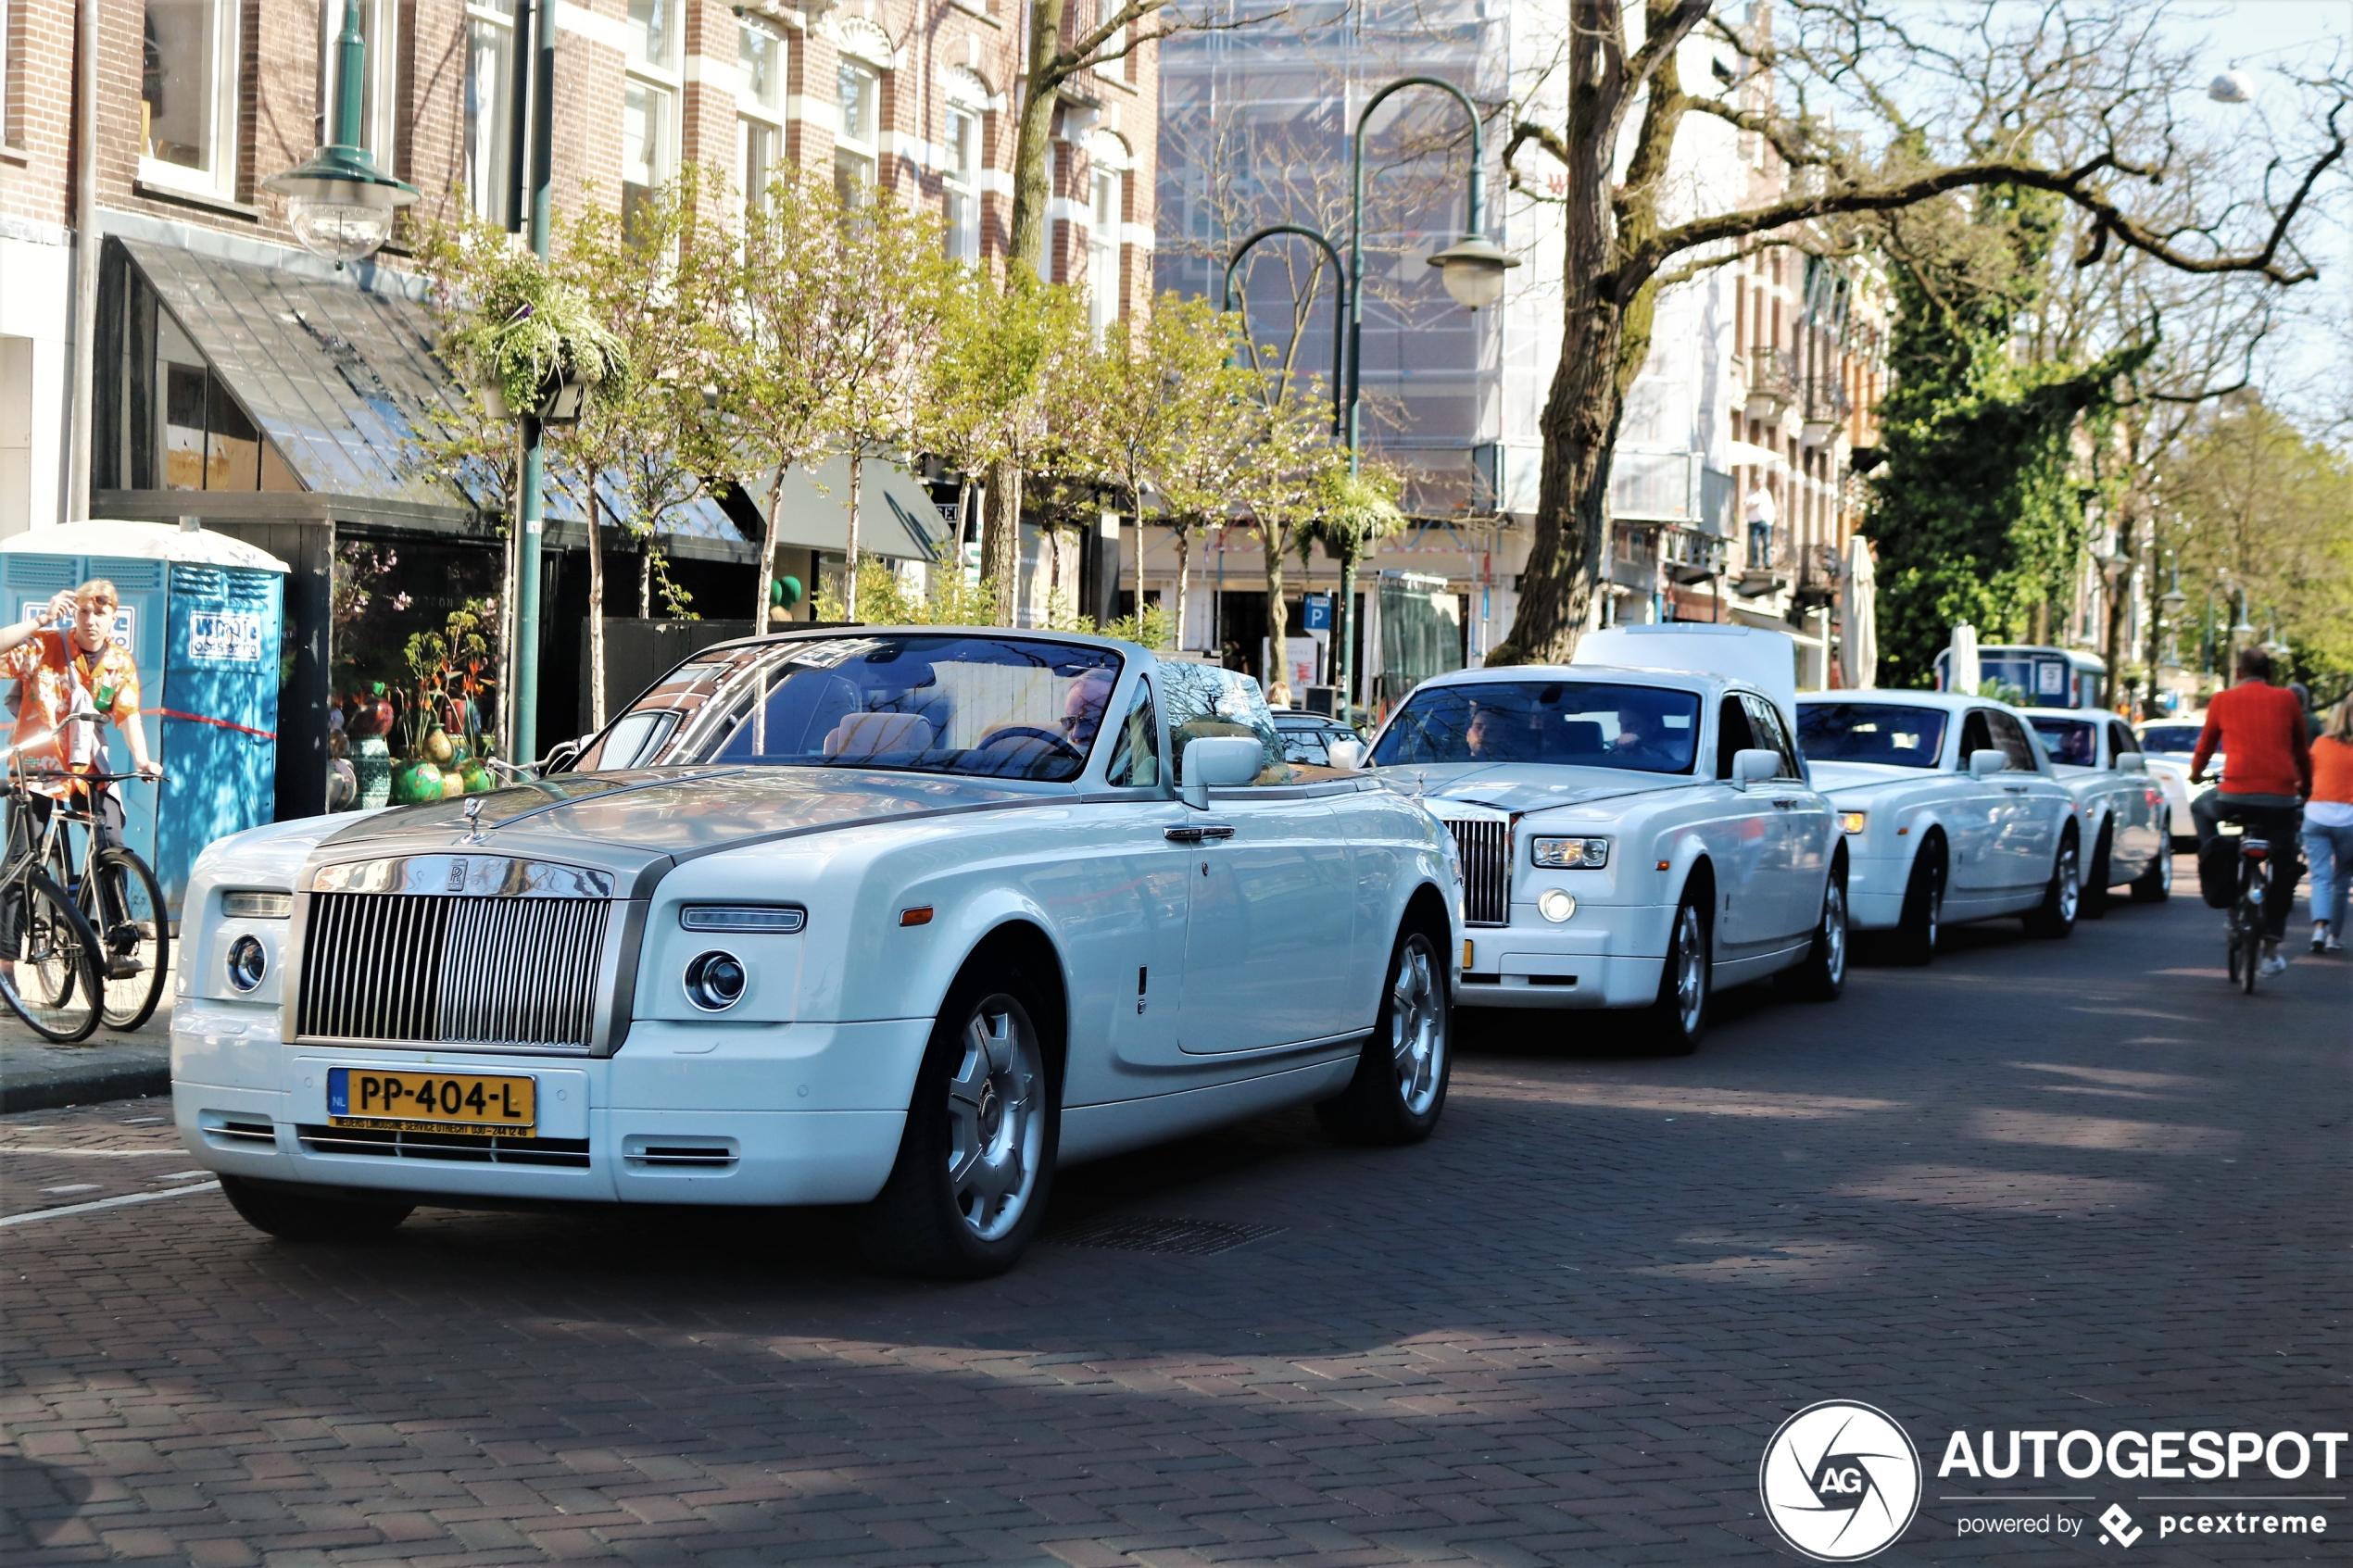 Lil Kleine geeft Amsterdam tijdelijk Dubai vibes